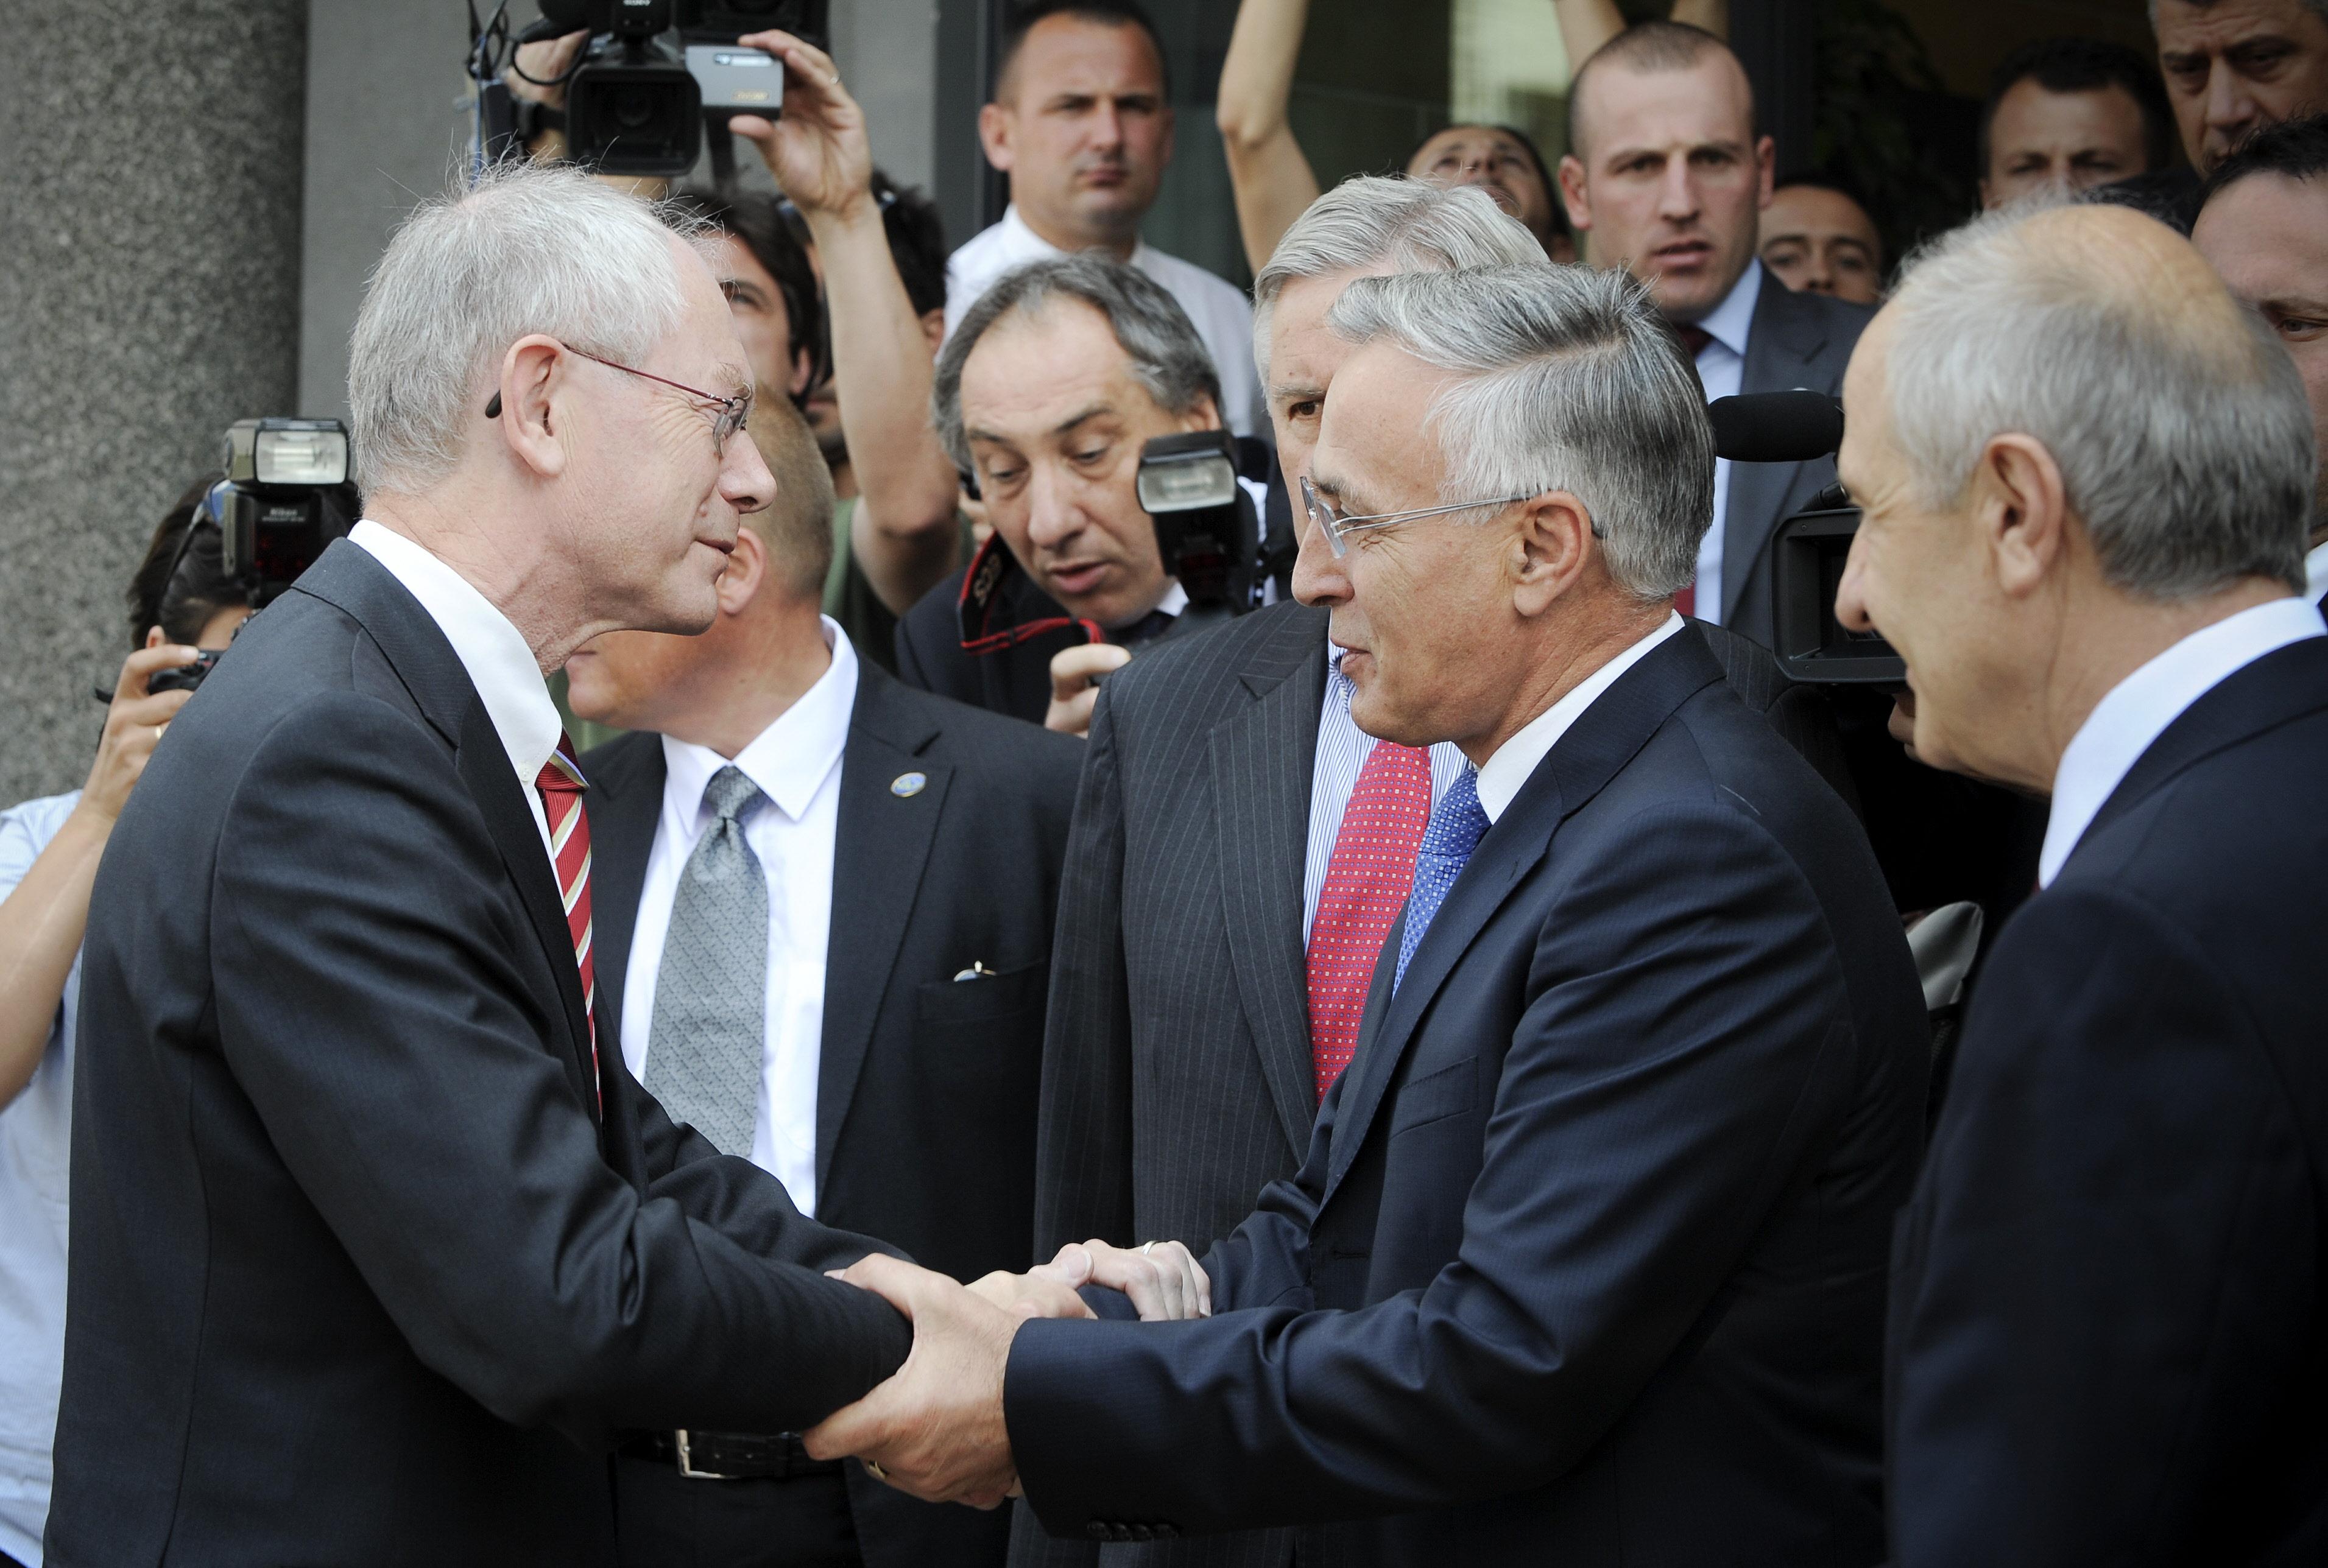 Kosovo's President Hashim Thaci resigns to face war crime trial